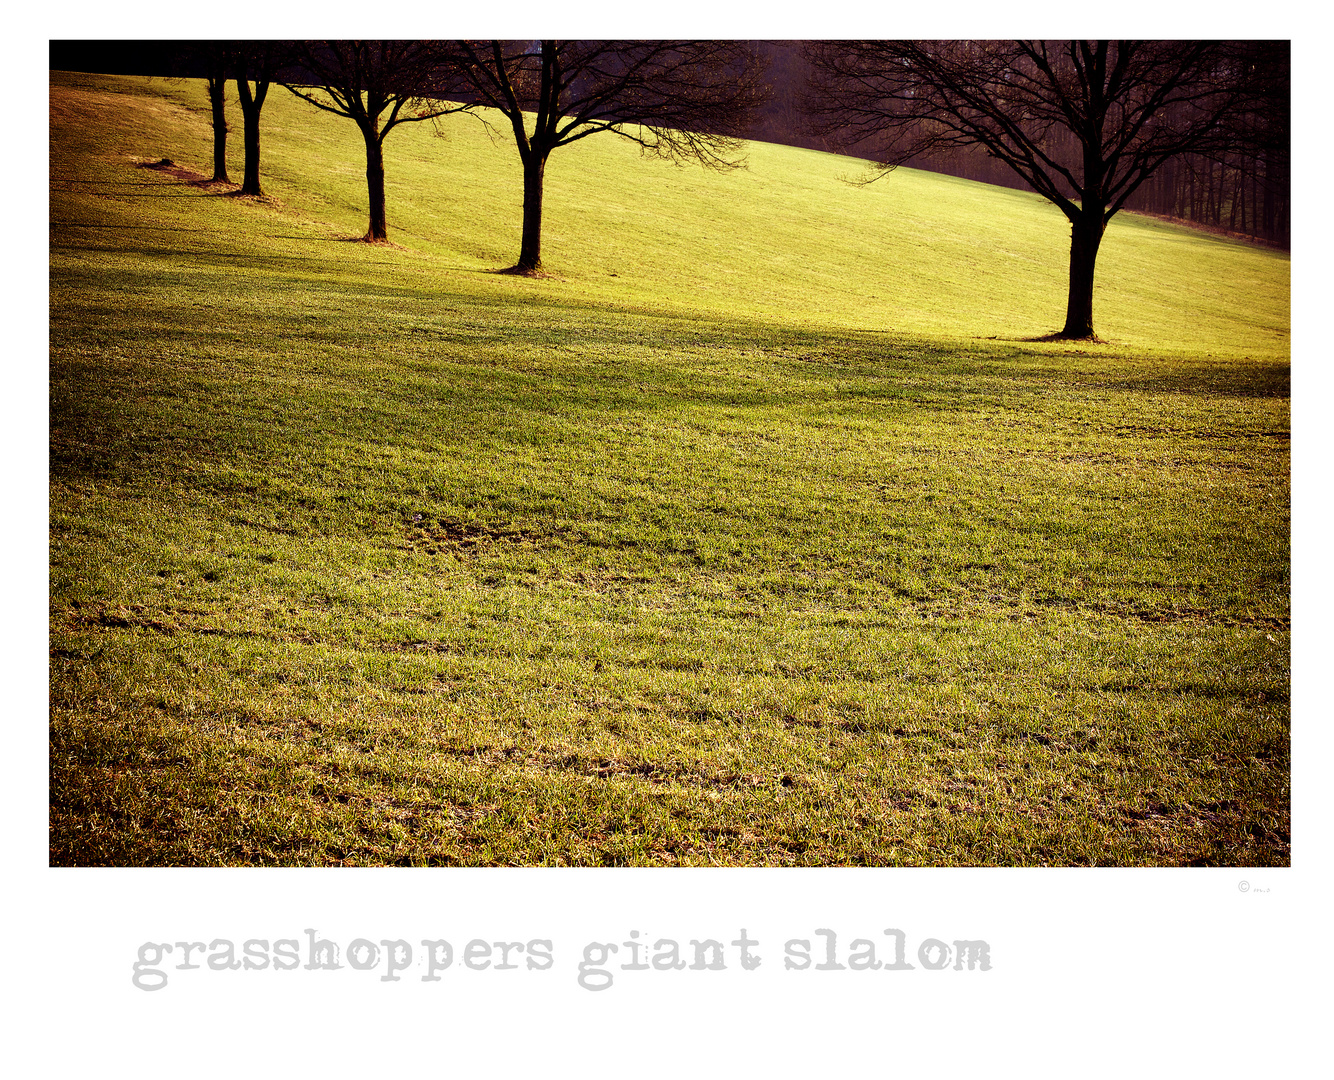 ~ grasshoppers giant slalom ~